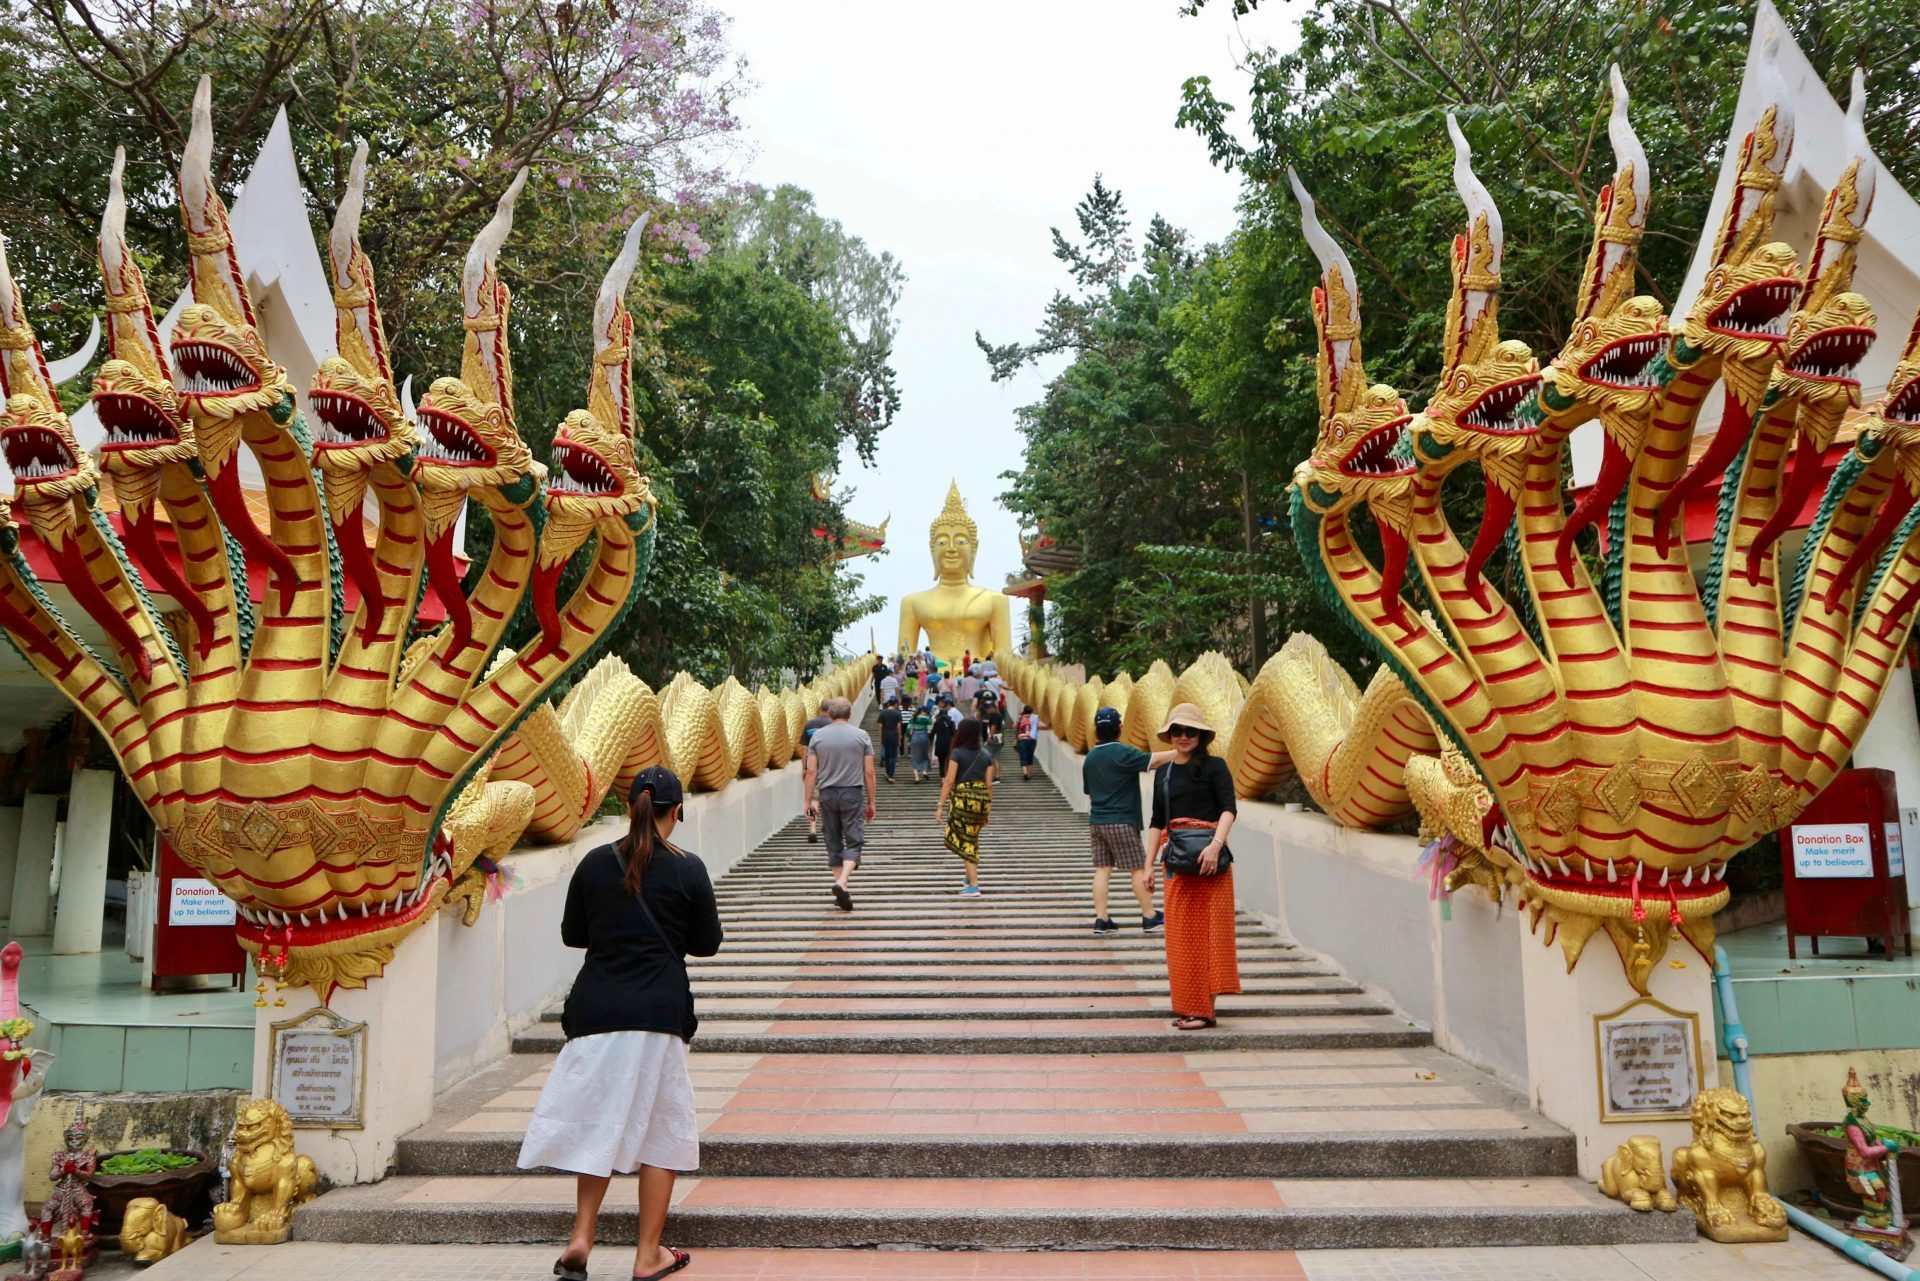 Wat Phra Khao Yai, the Big Buddha Hill that I visited on my Bangkok and Pattaya trip.